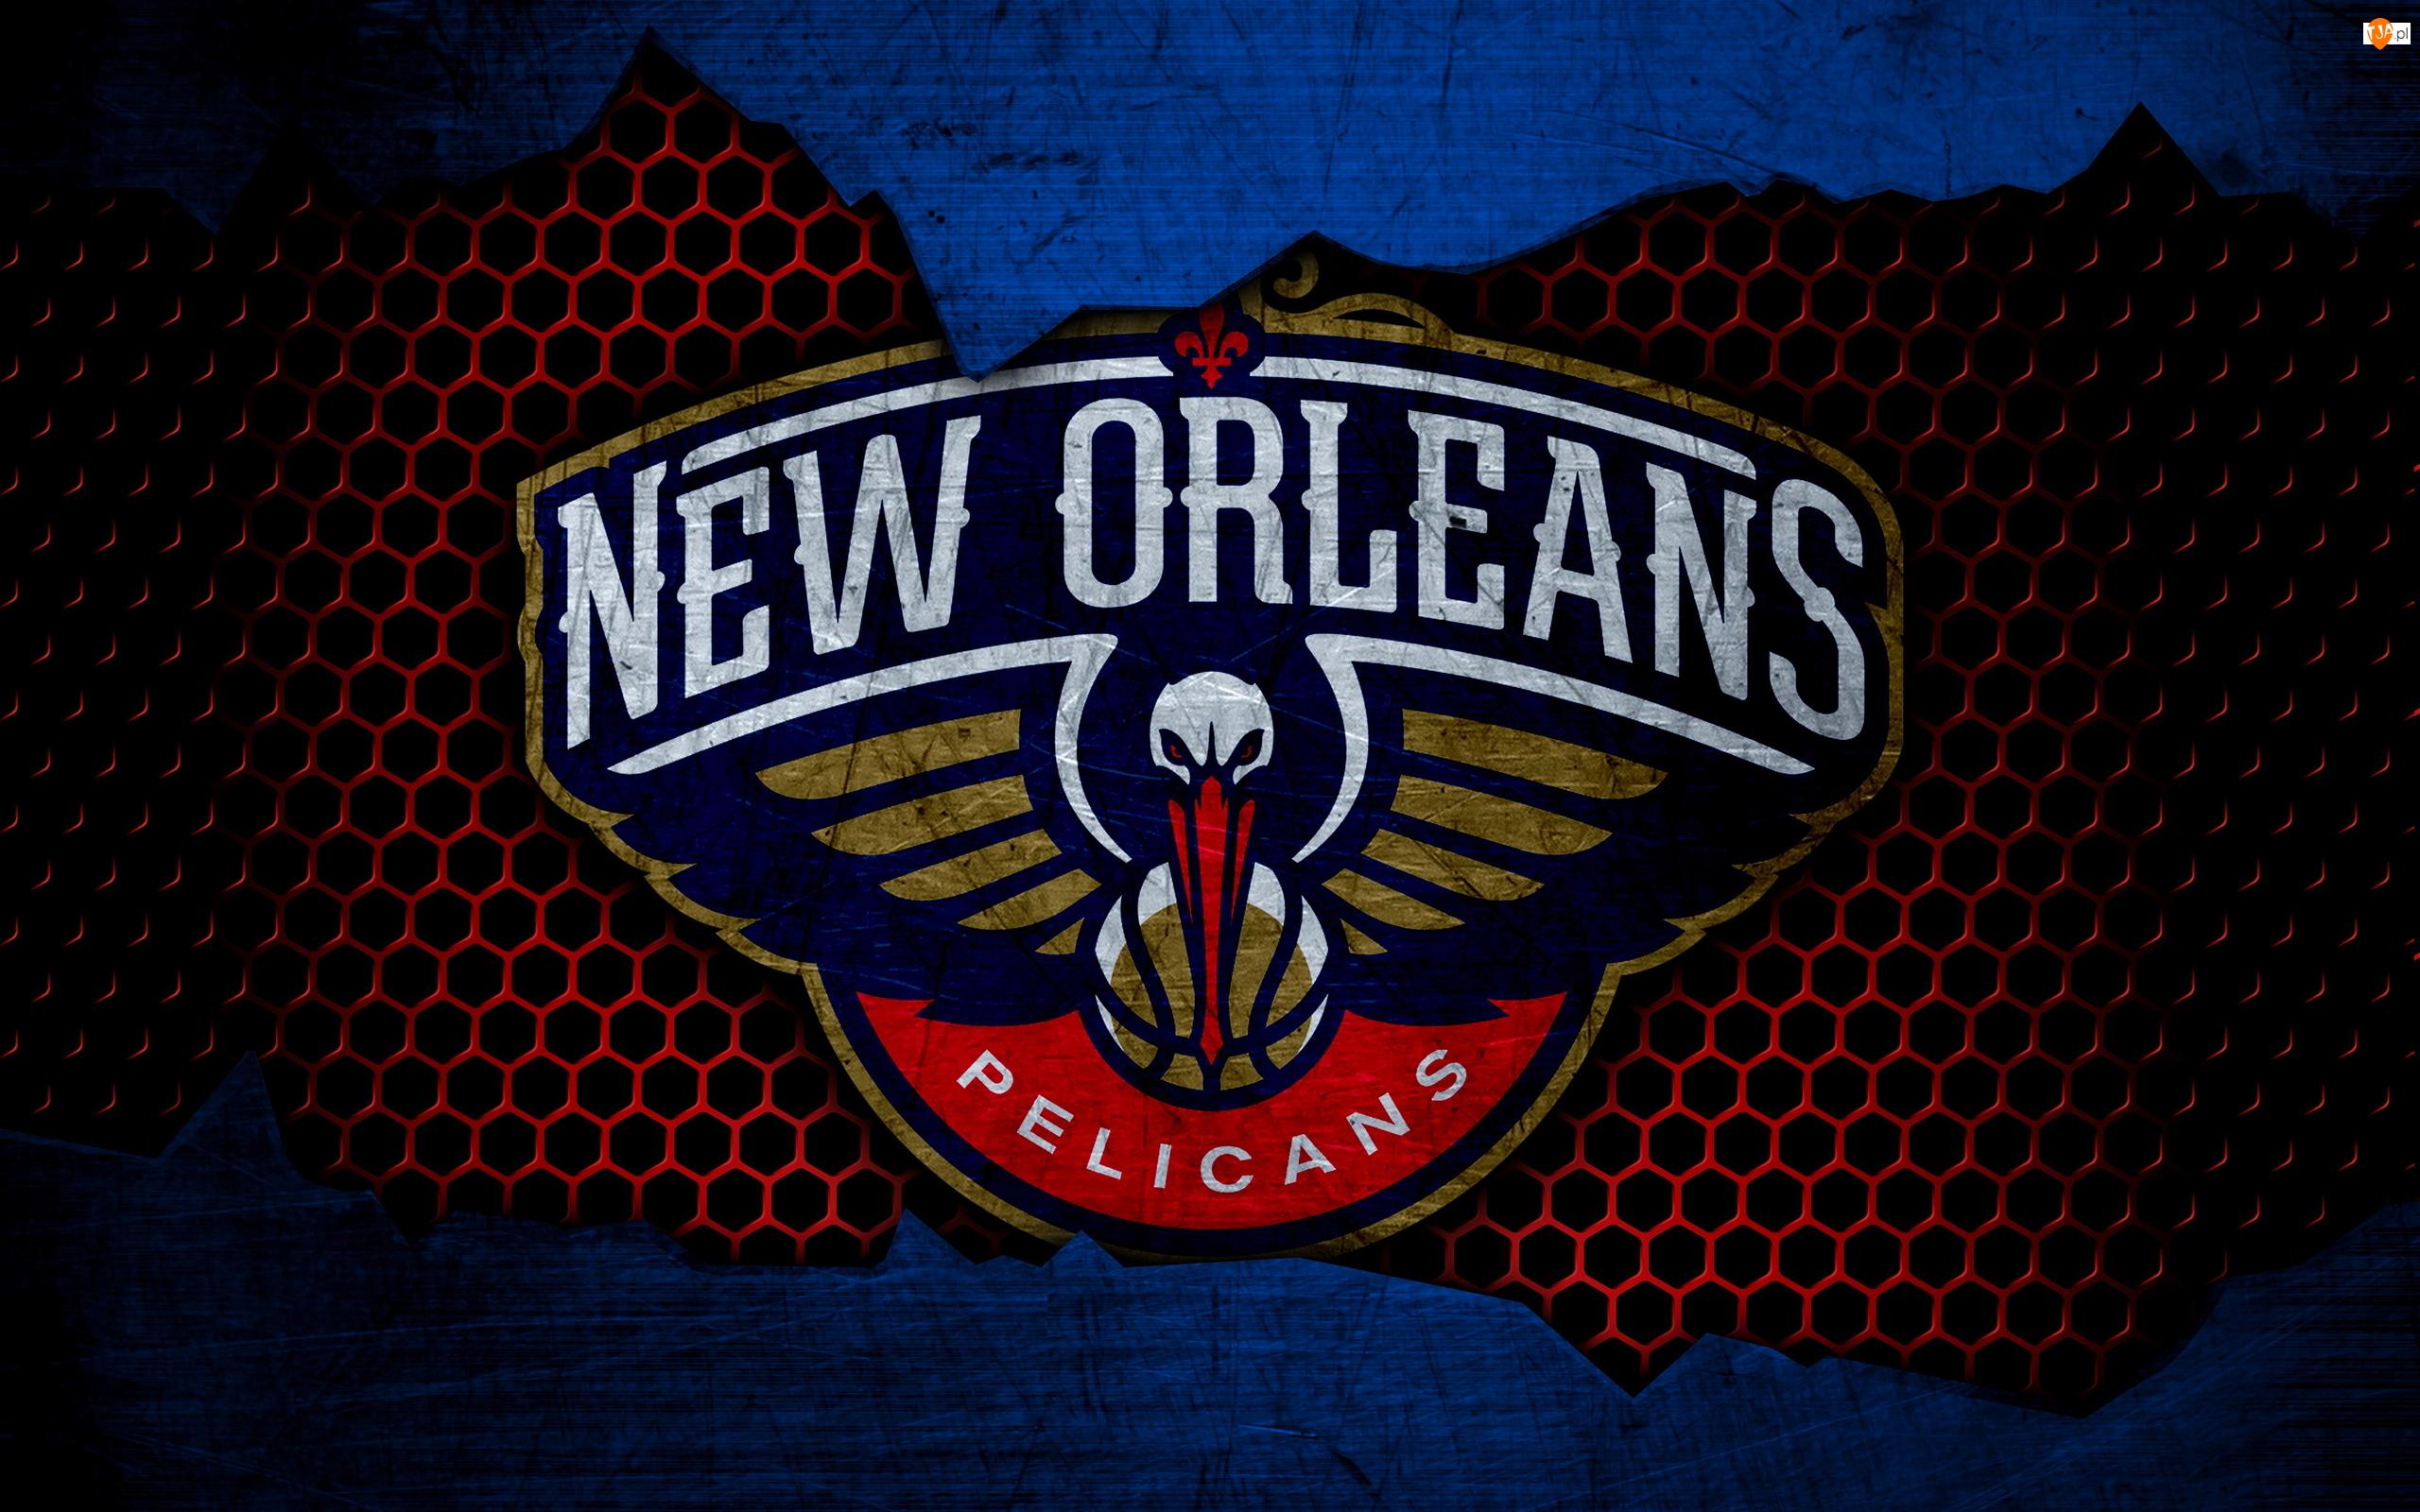 Koszykówka, Logo, New Orleans Pelicans